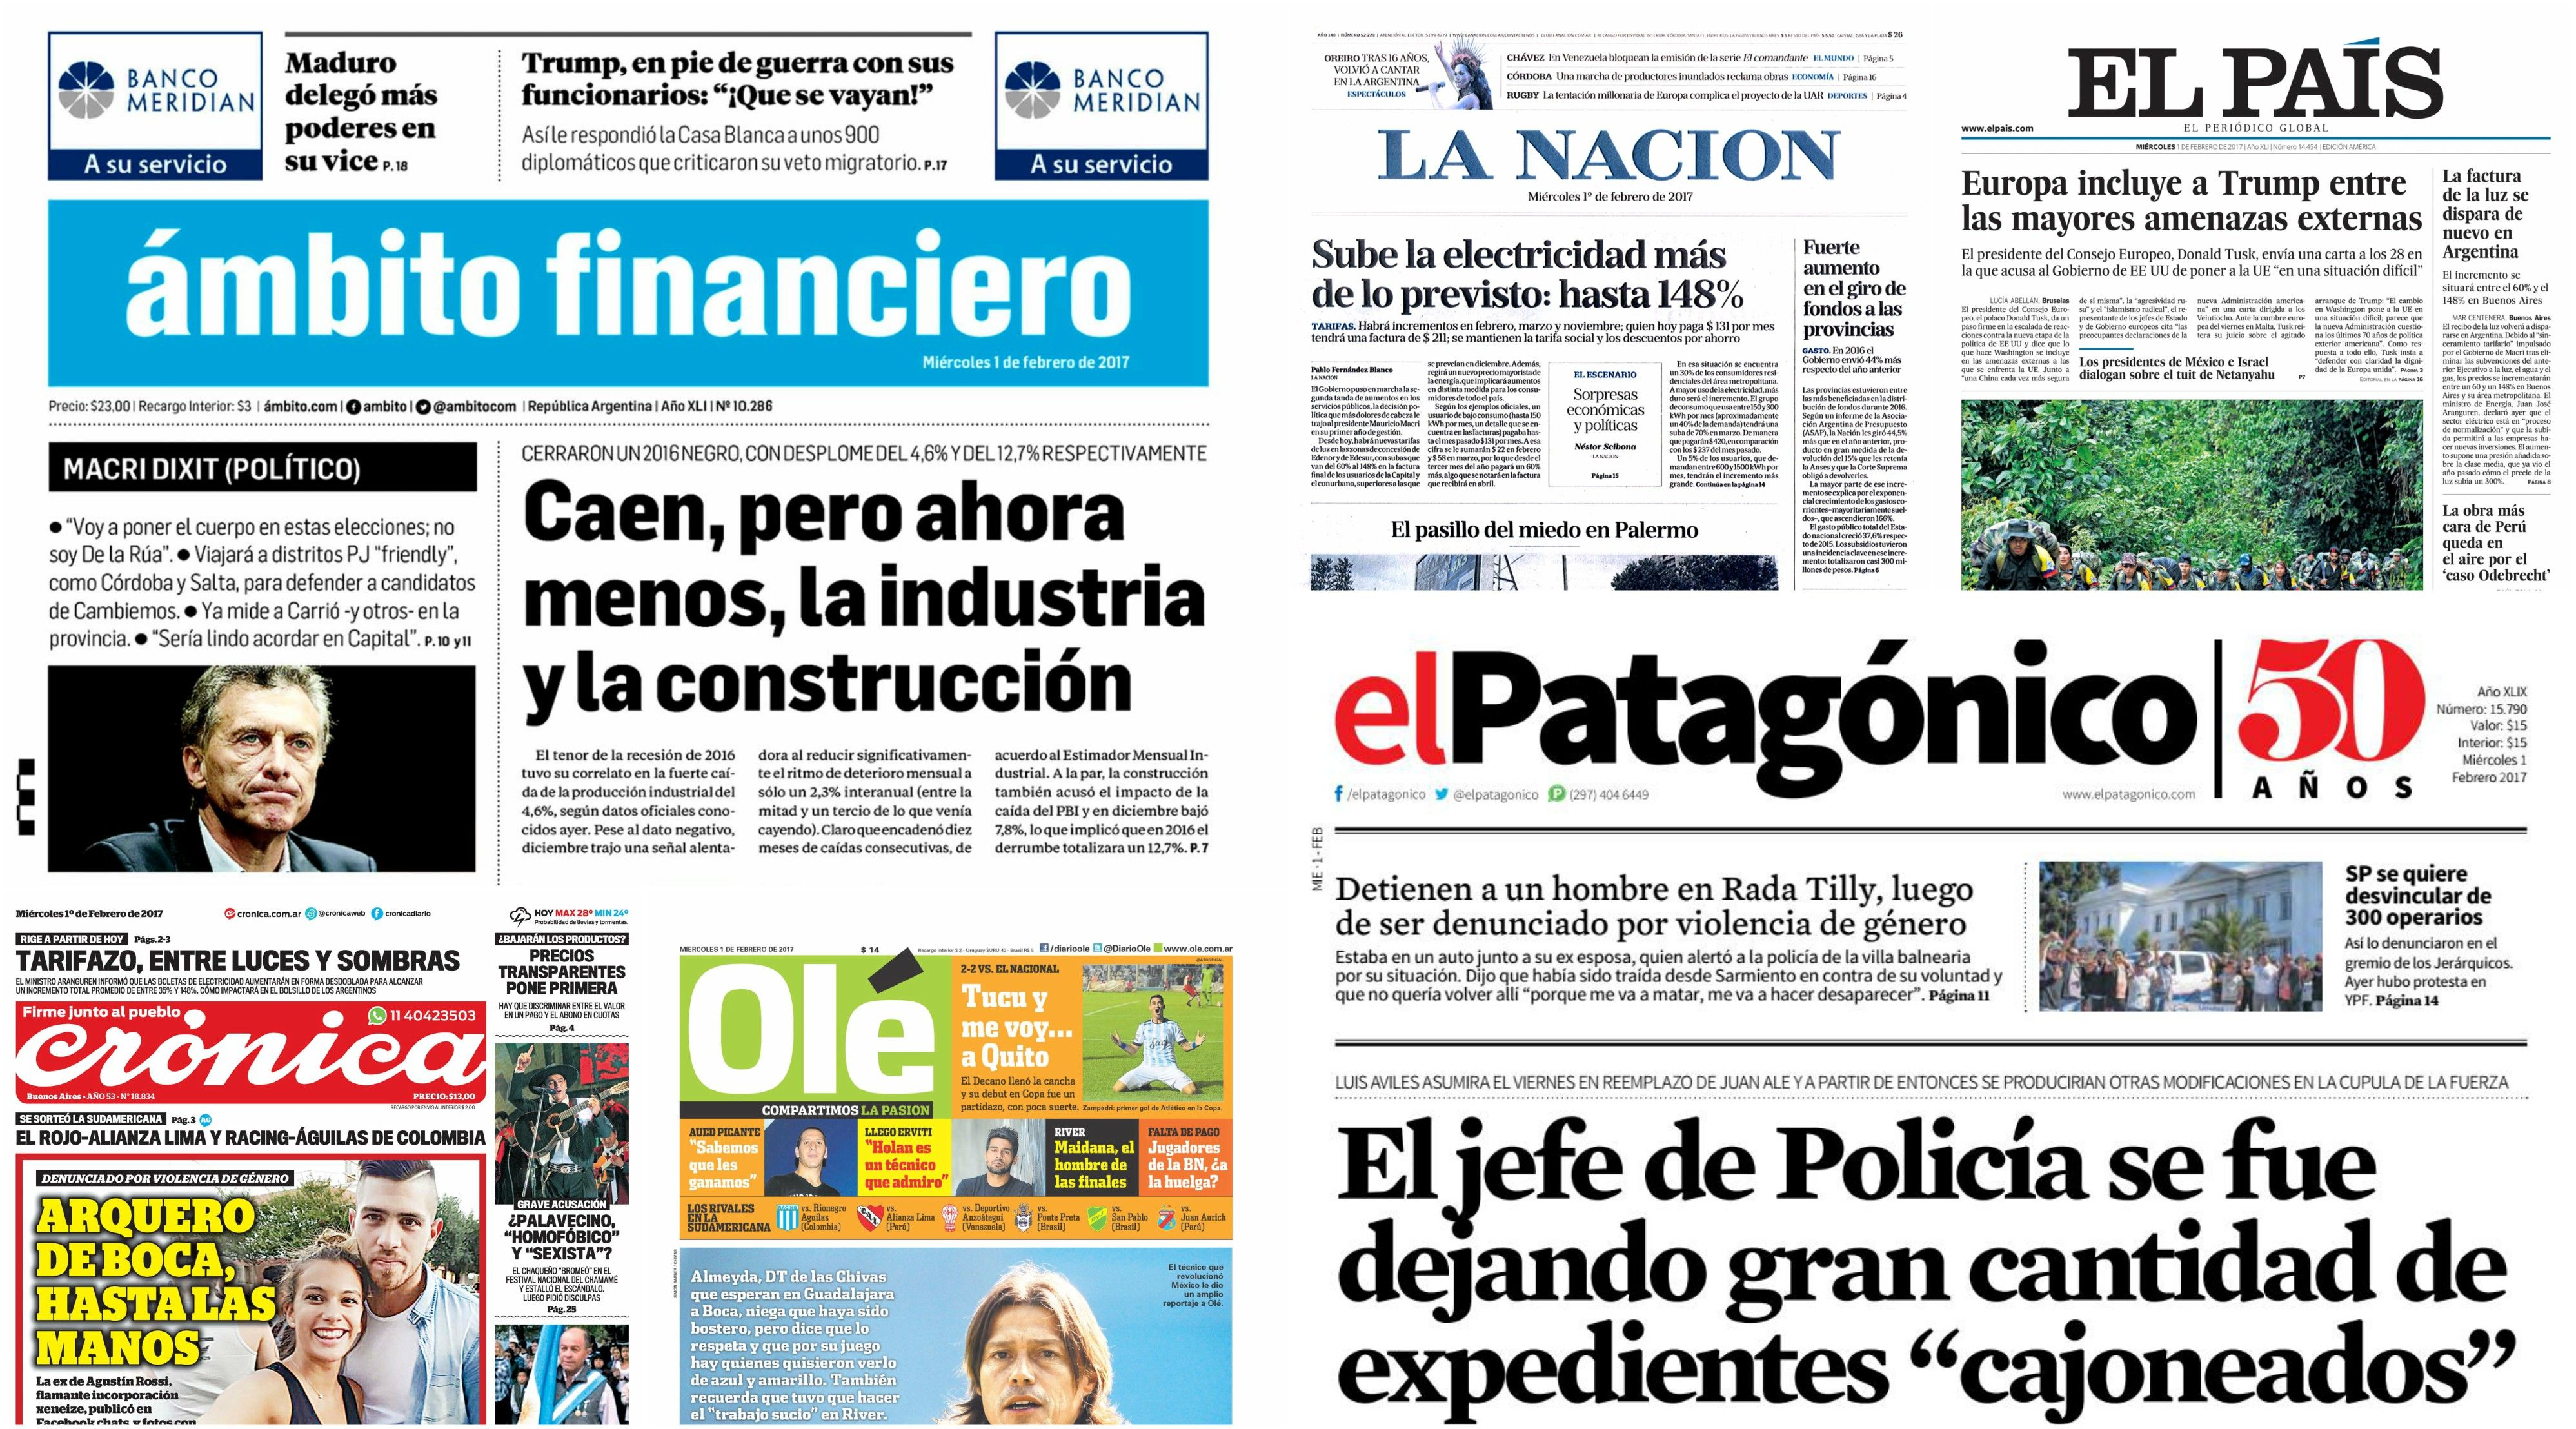 Tapas de diarios del miércoles 1 de febrero de 2017